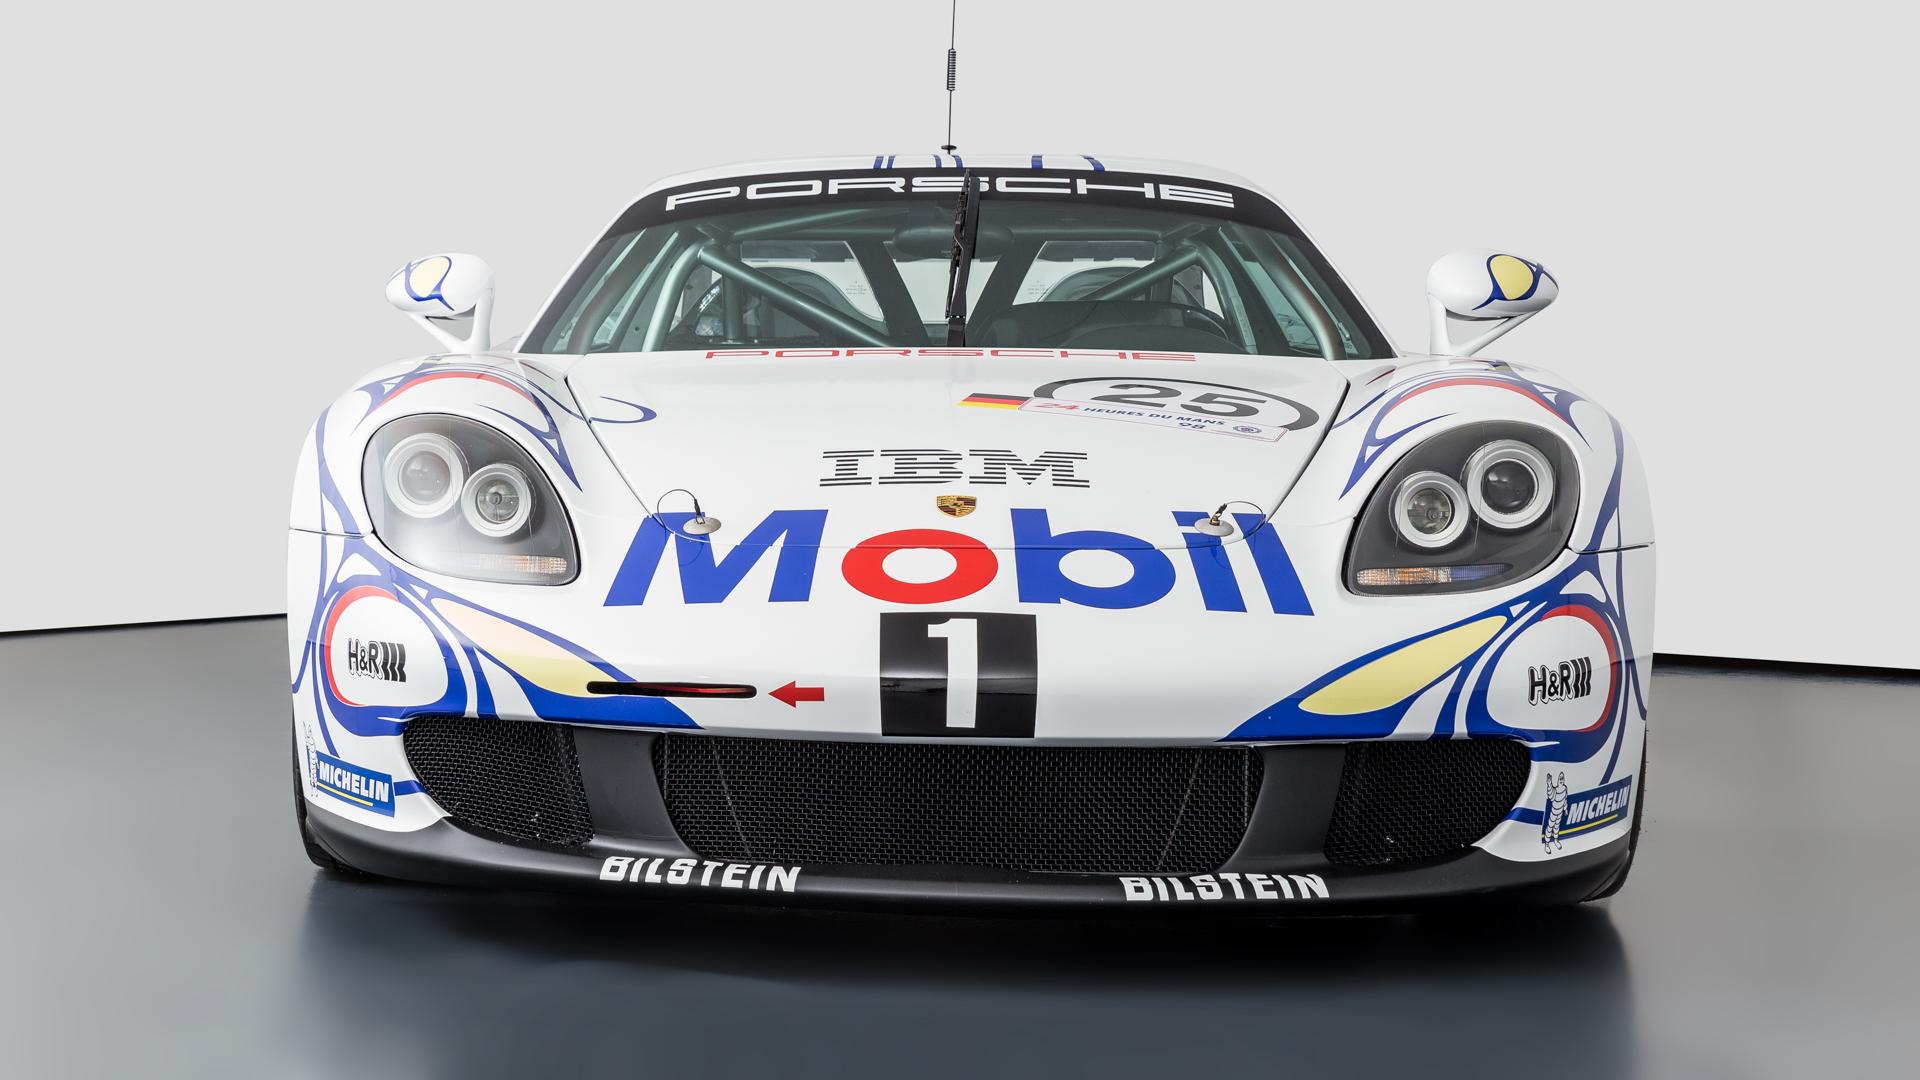 Carrera GT Racecar front